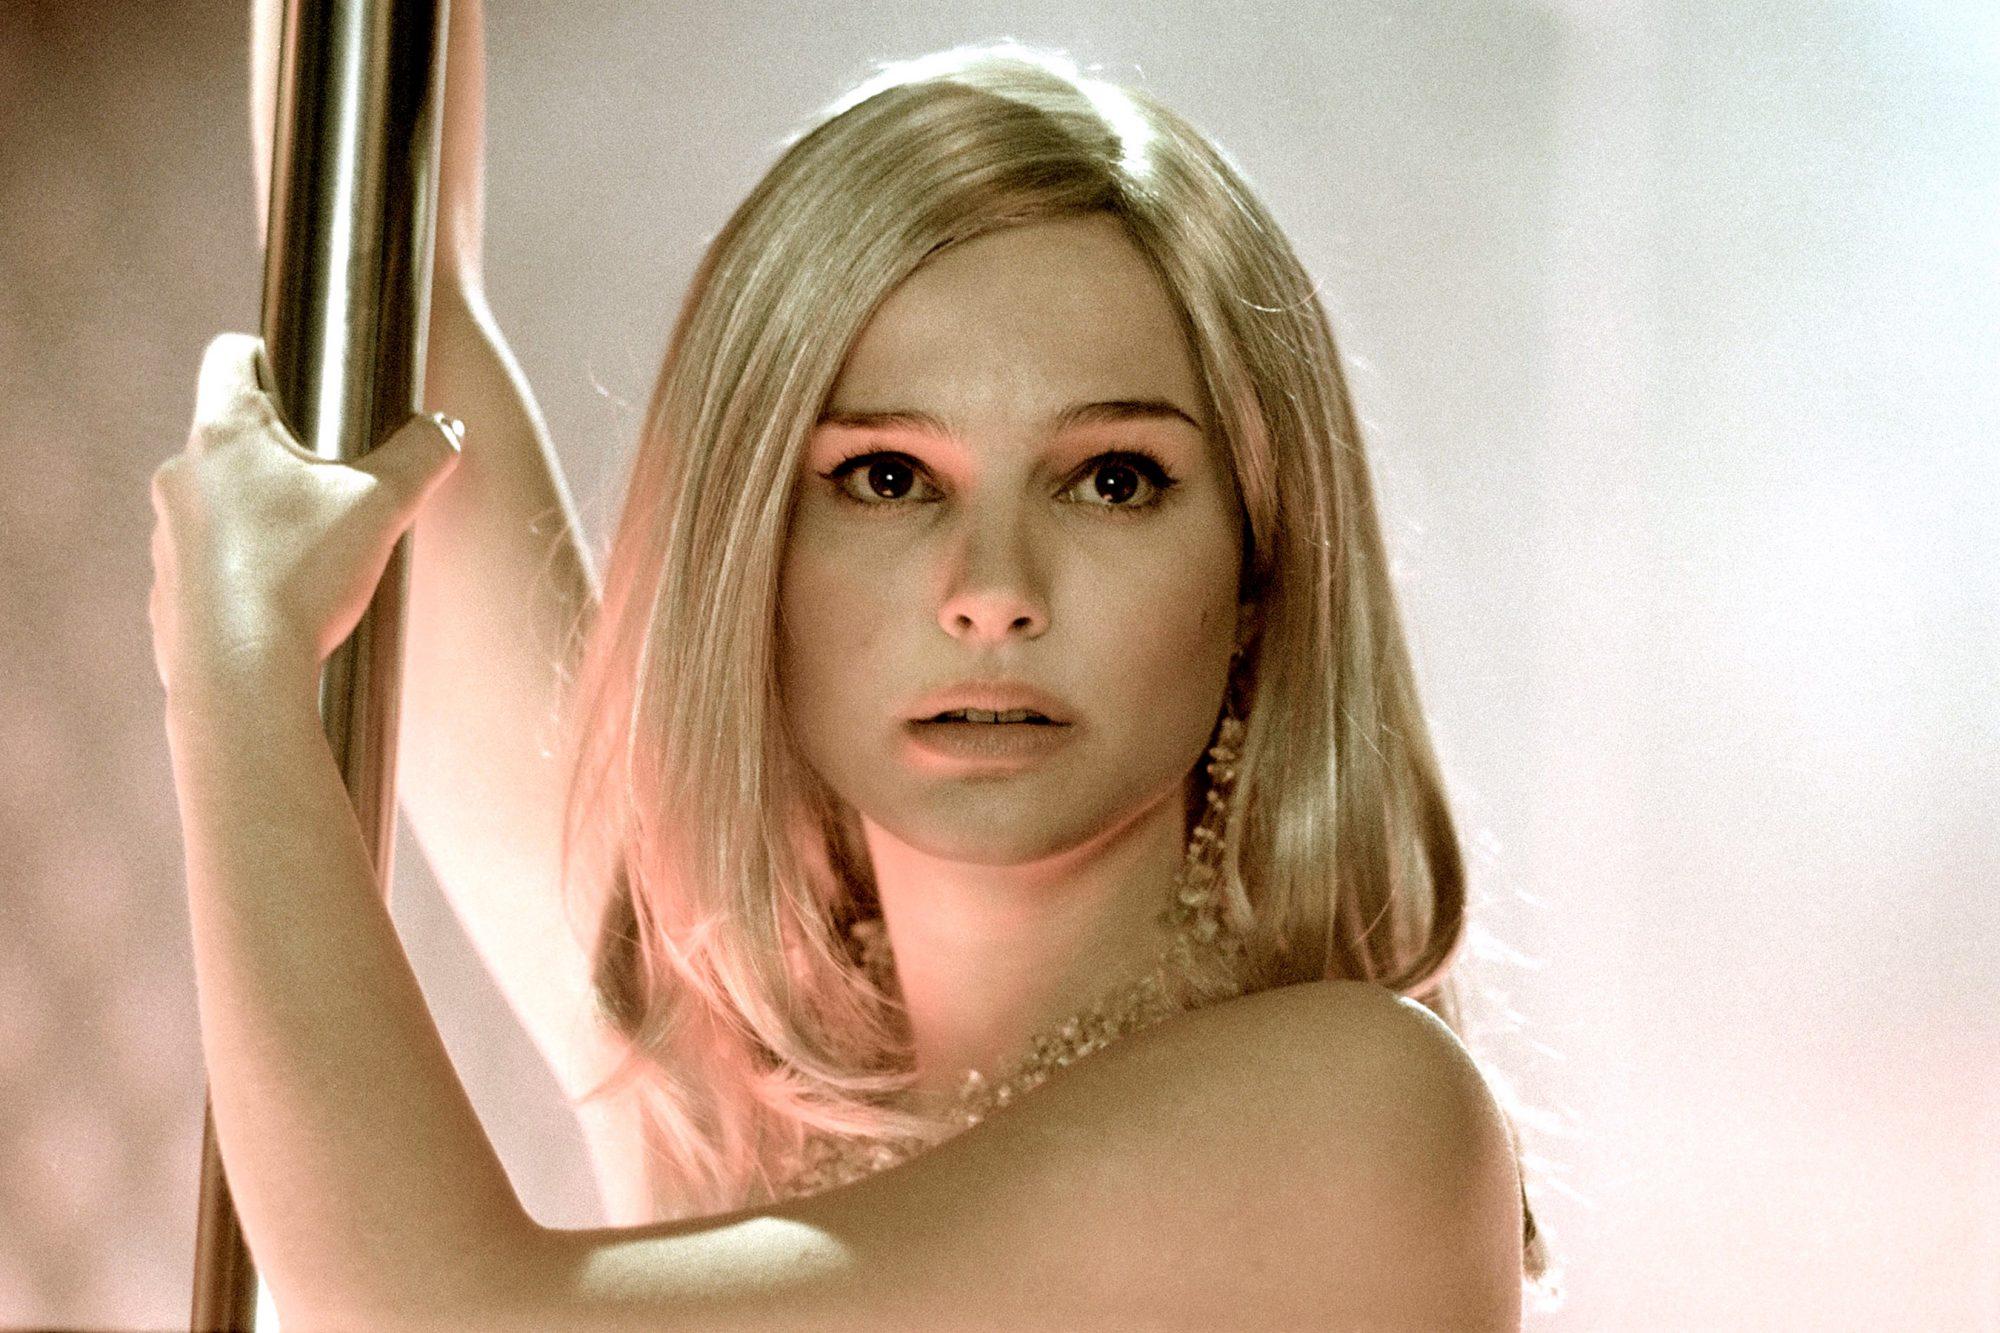 CLOSER, Natalie Portman, 2004, (c) Columbia/courtesy Everett Collection